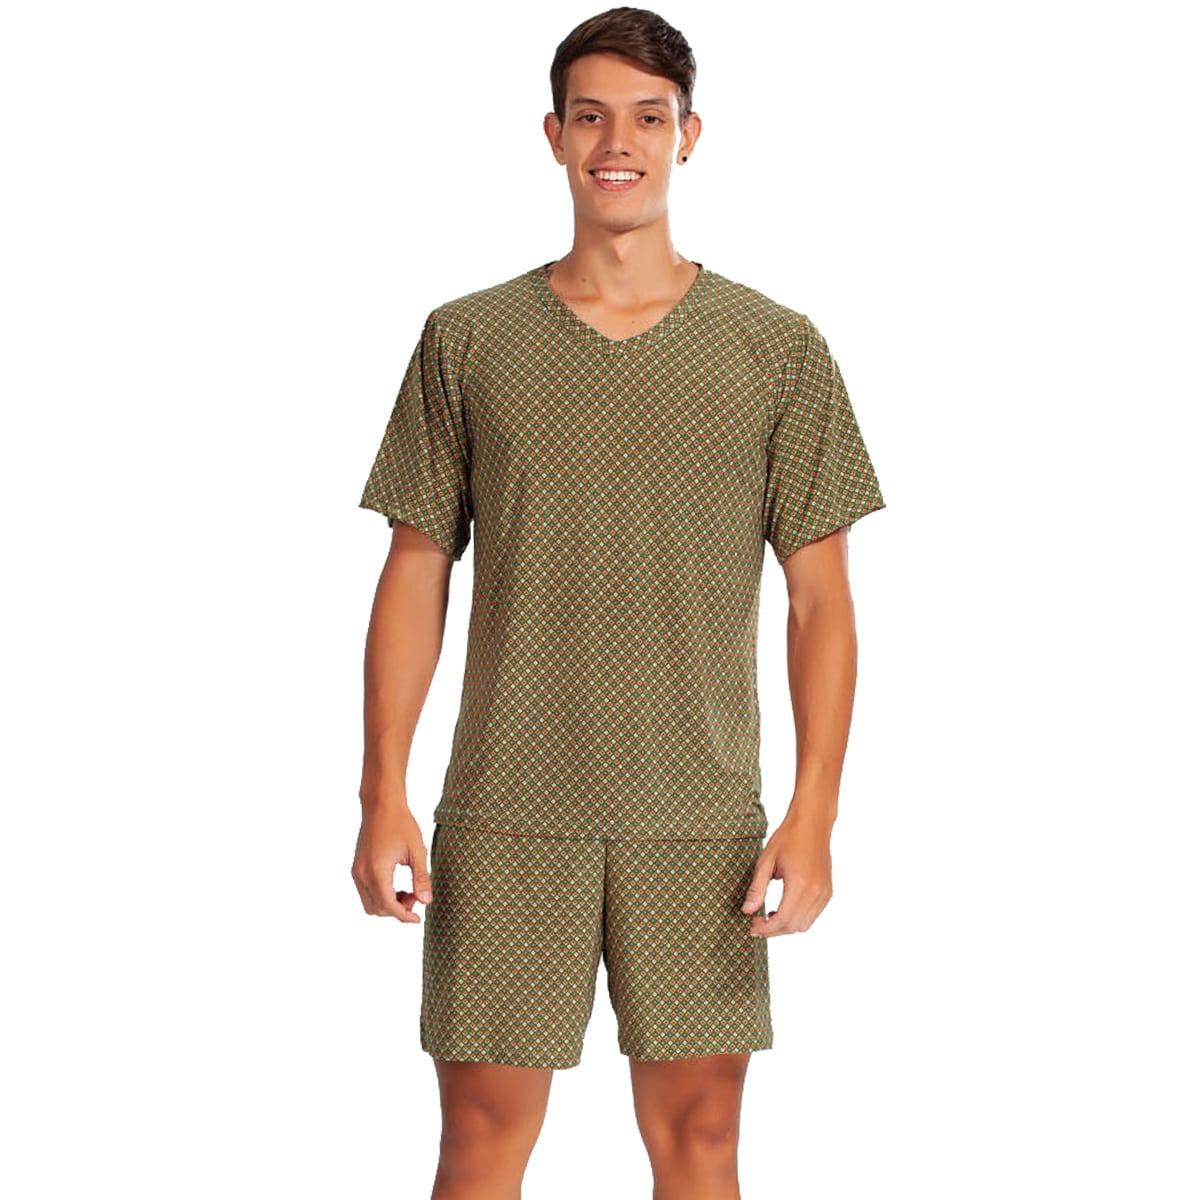 Pijama Curto Camisa Meia Manga Short Liganete Estampado Masculino Adulto Ref: 1365